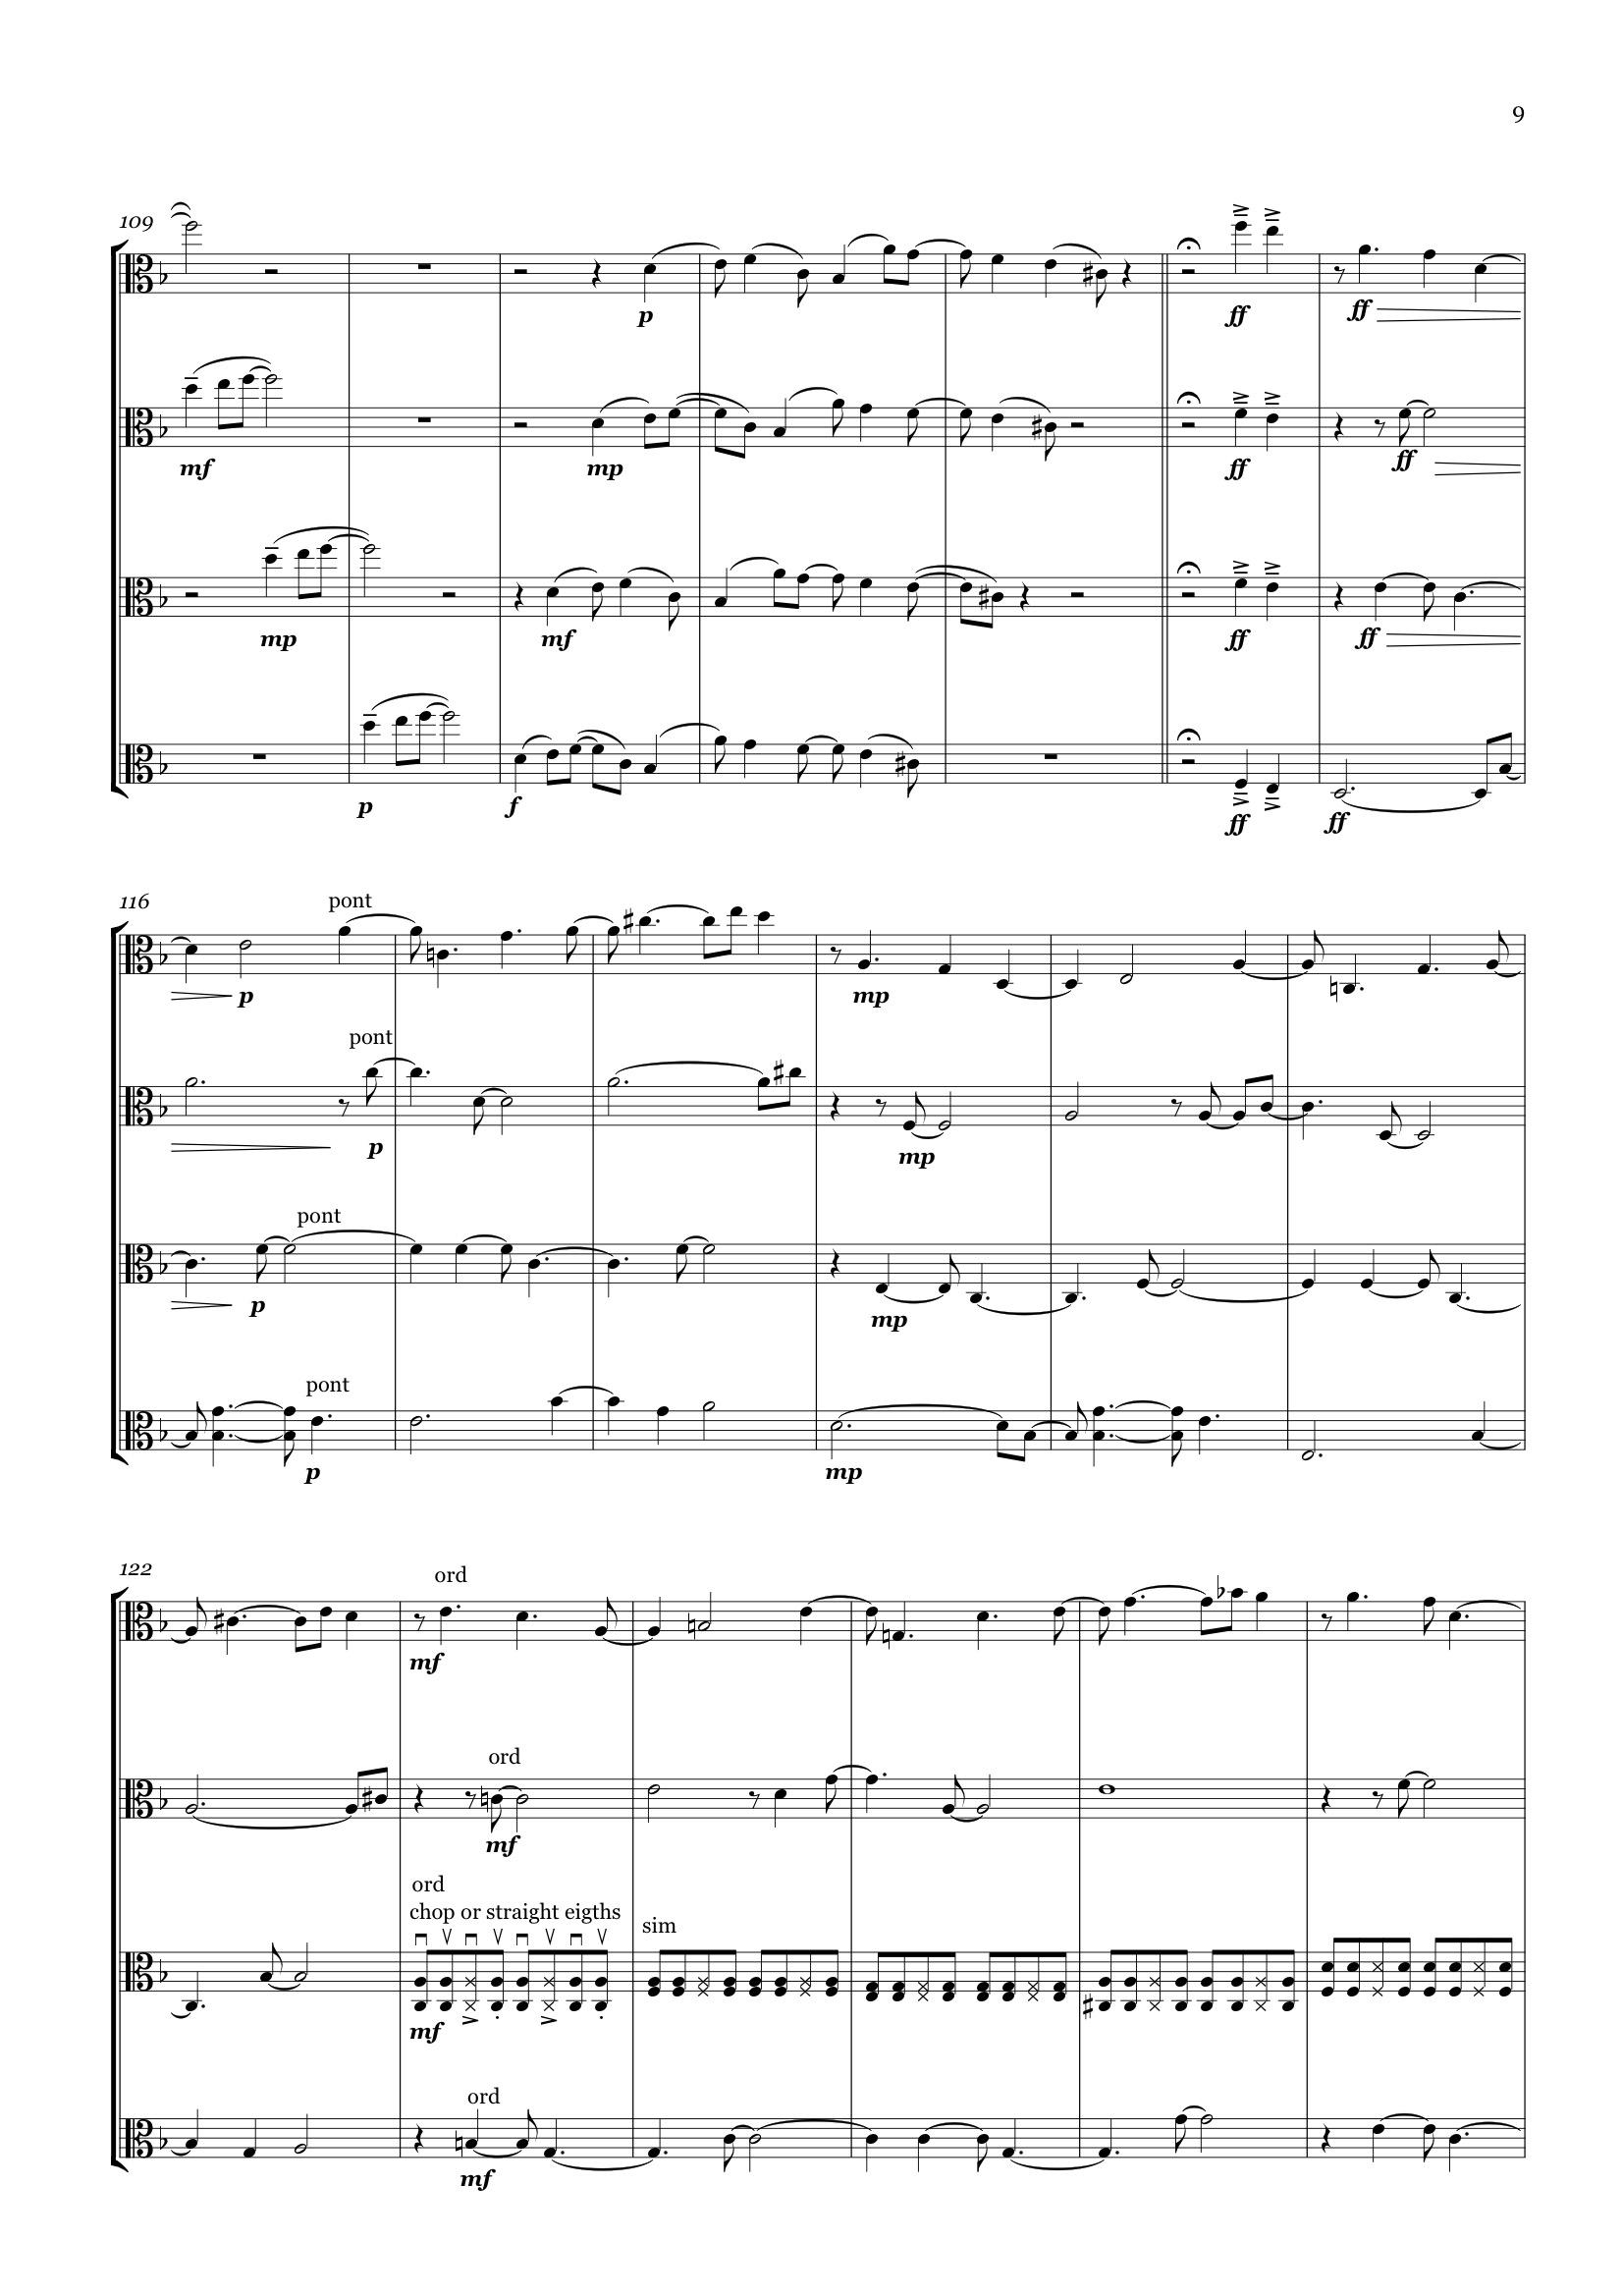 Broken Lines - Viola Quartet Score, 9.25.17 9.jpeg